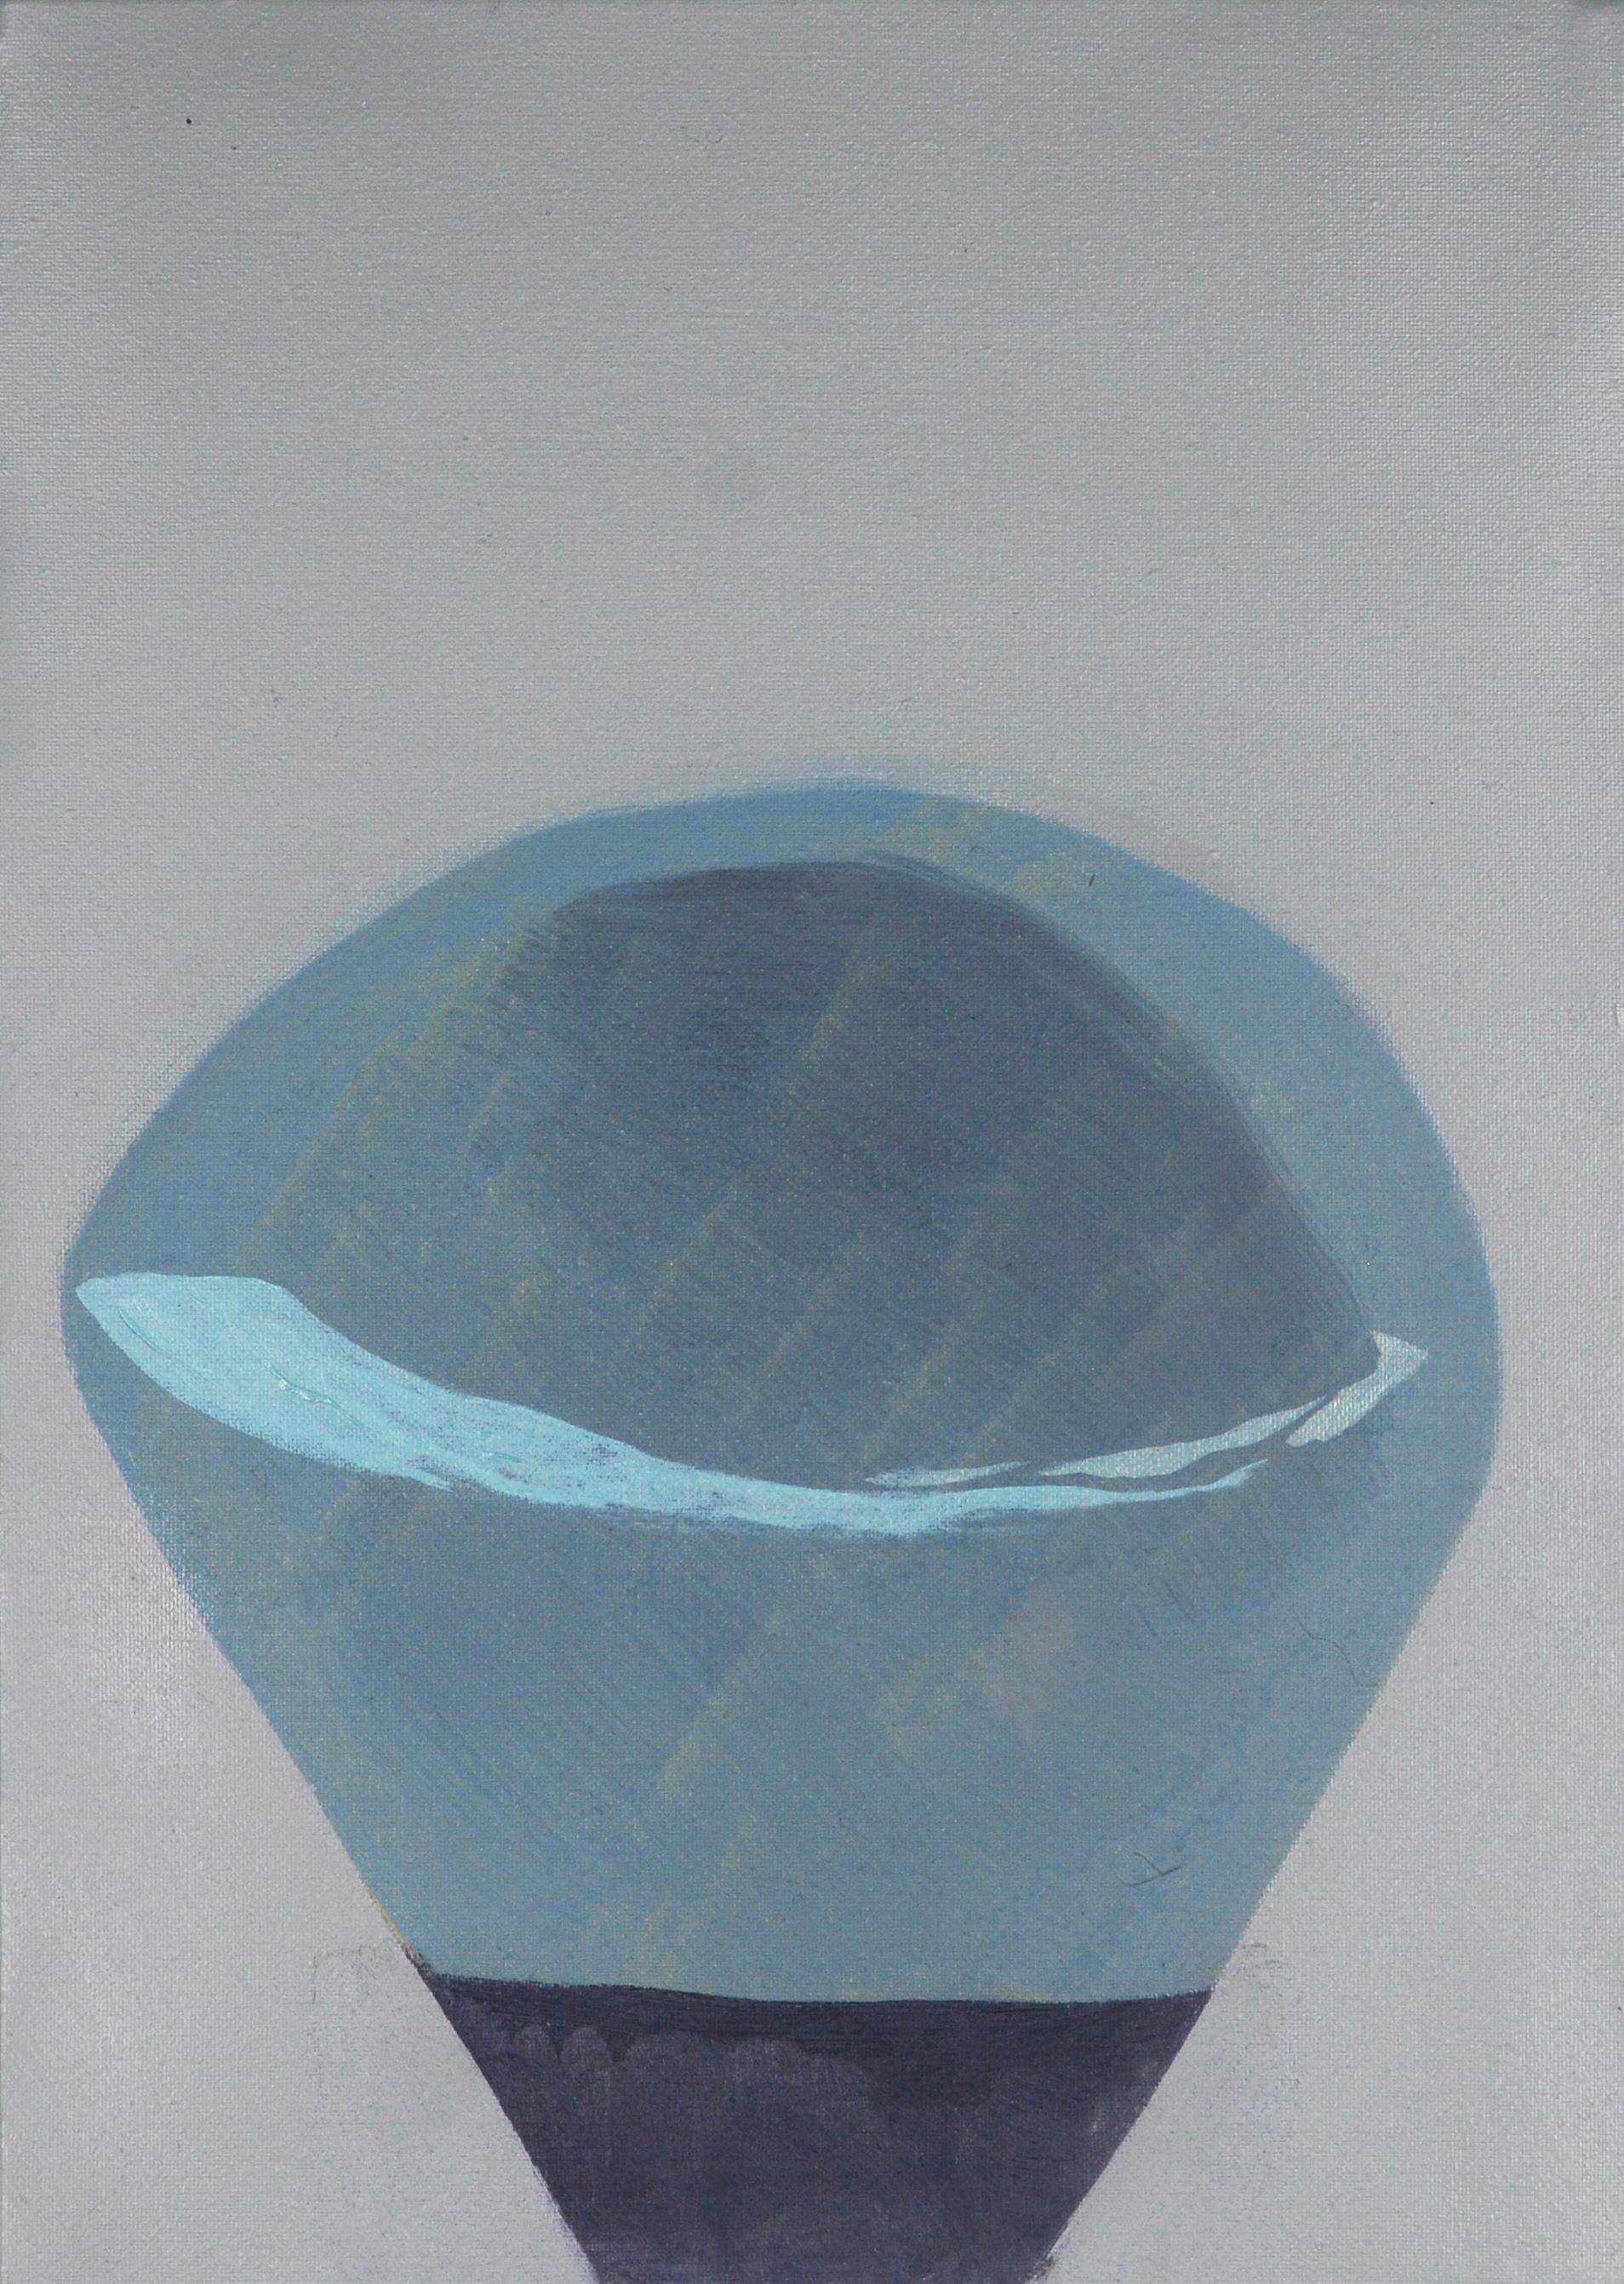 Pin Head, 2013, Oil on canvas, 35 x 25 cm